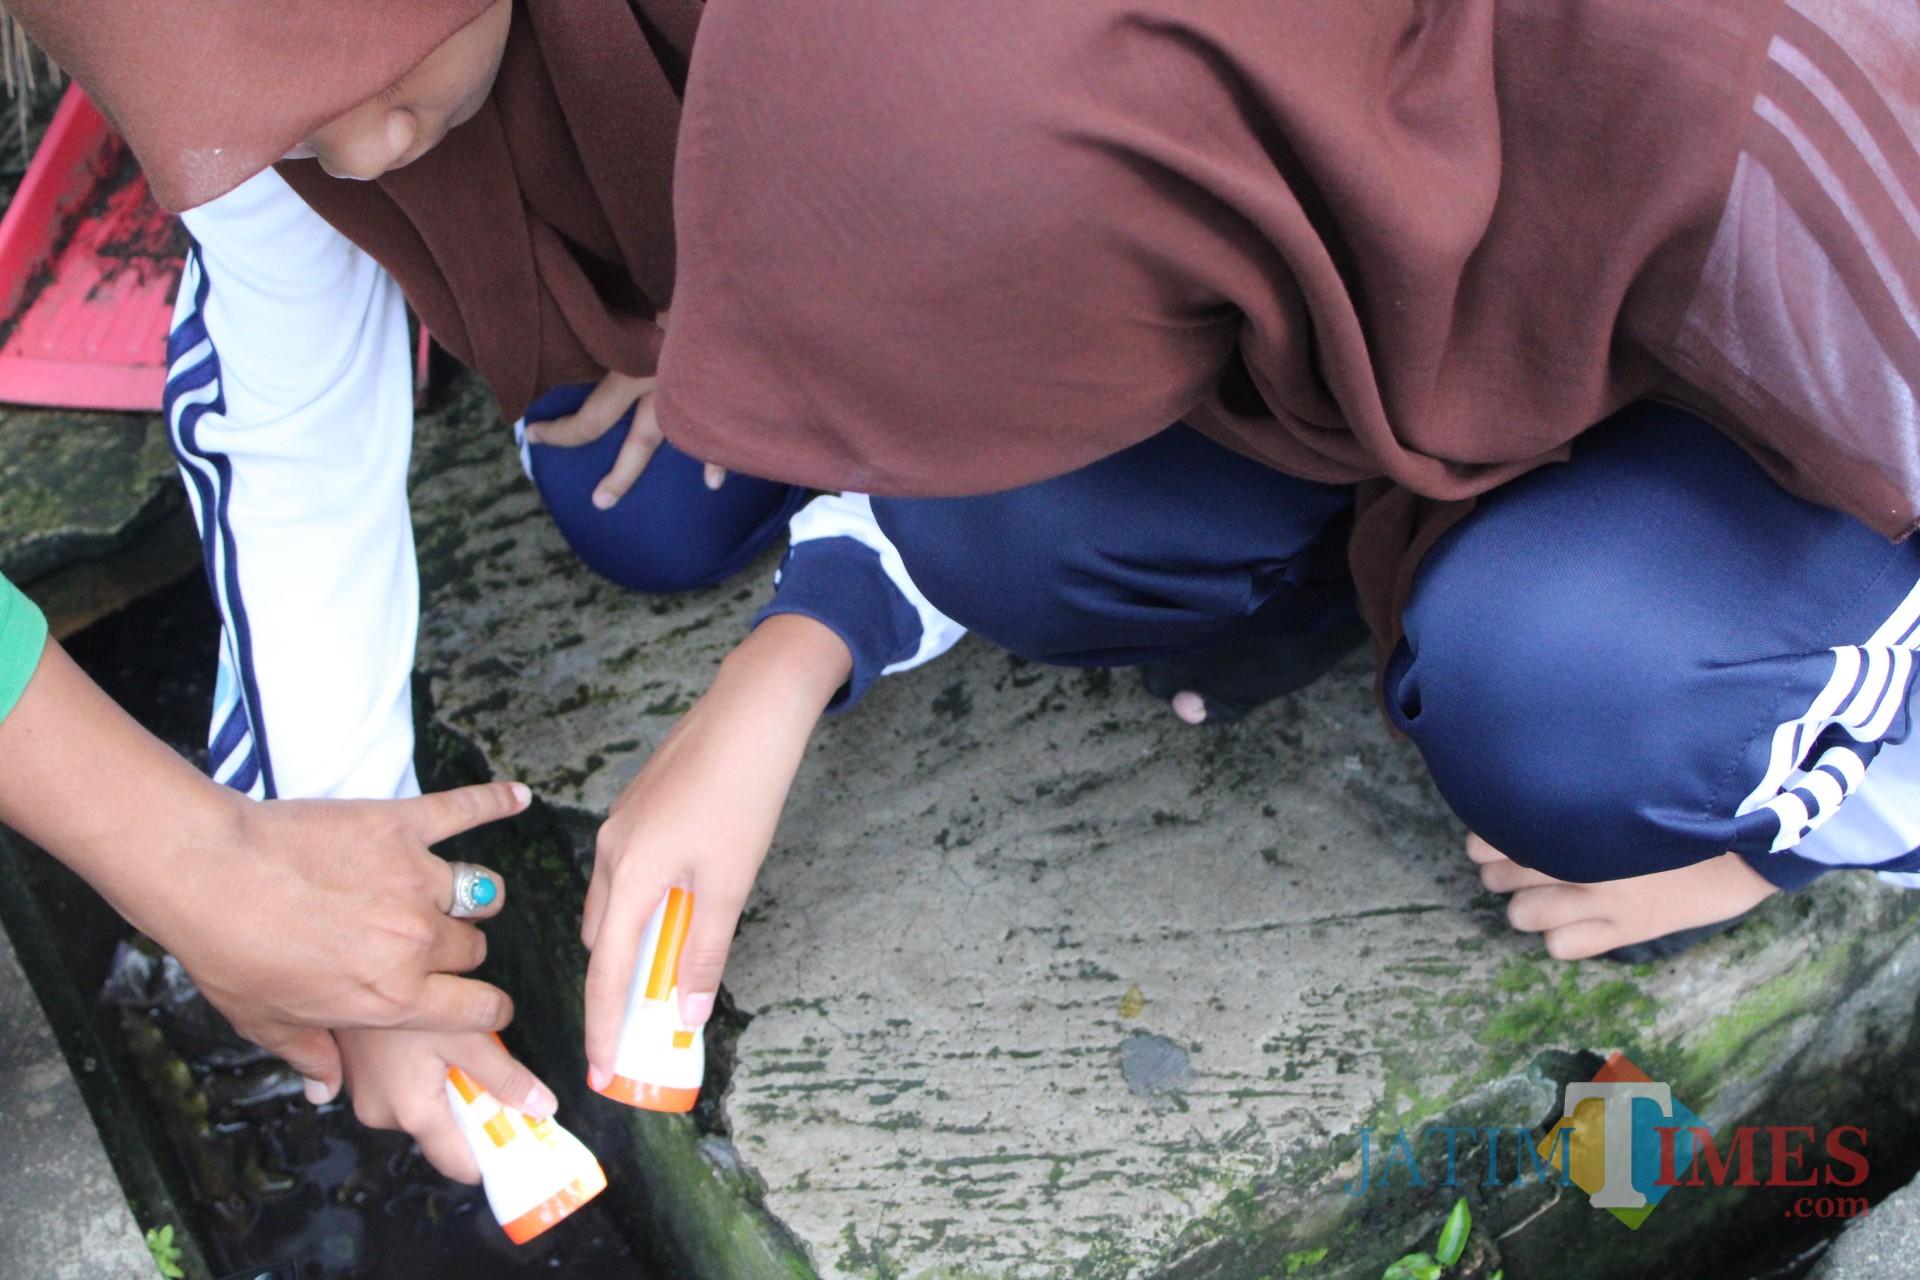 Sejumlah anggota Pokja Jubastik SMPN 2 Jombang saat memantau jentik nyamuk di selokan sekolah. (Foto : Adi Rosul / JombangTIMES)